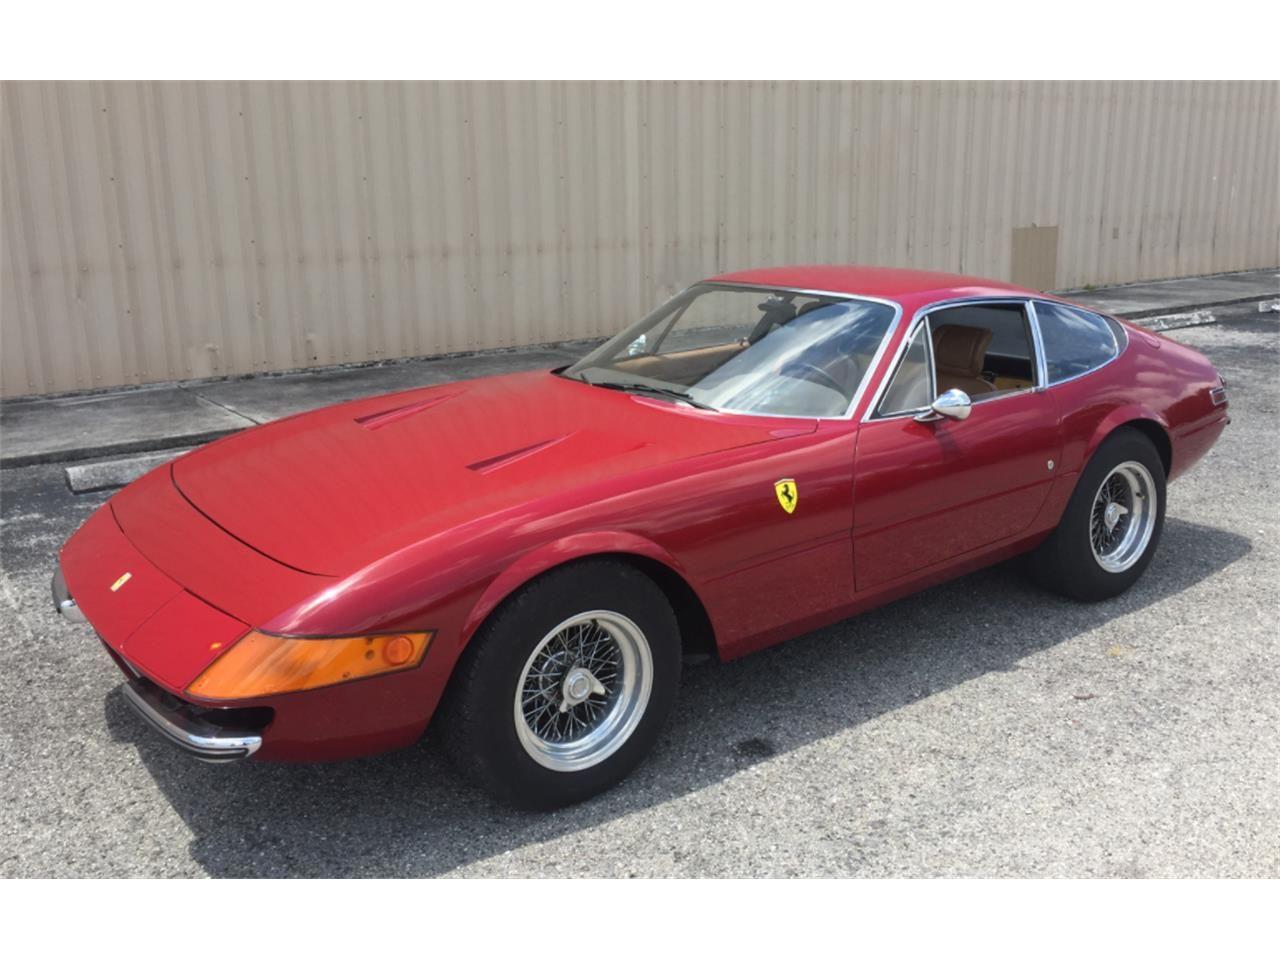 1972 Ferrari 365 GTB 1 of only 1274 produced Ferrari car